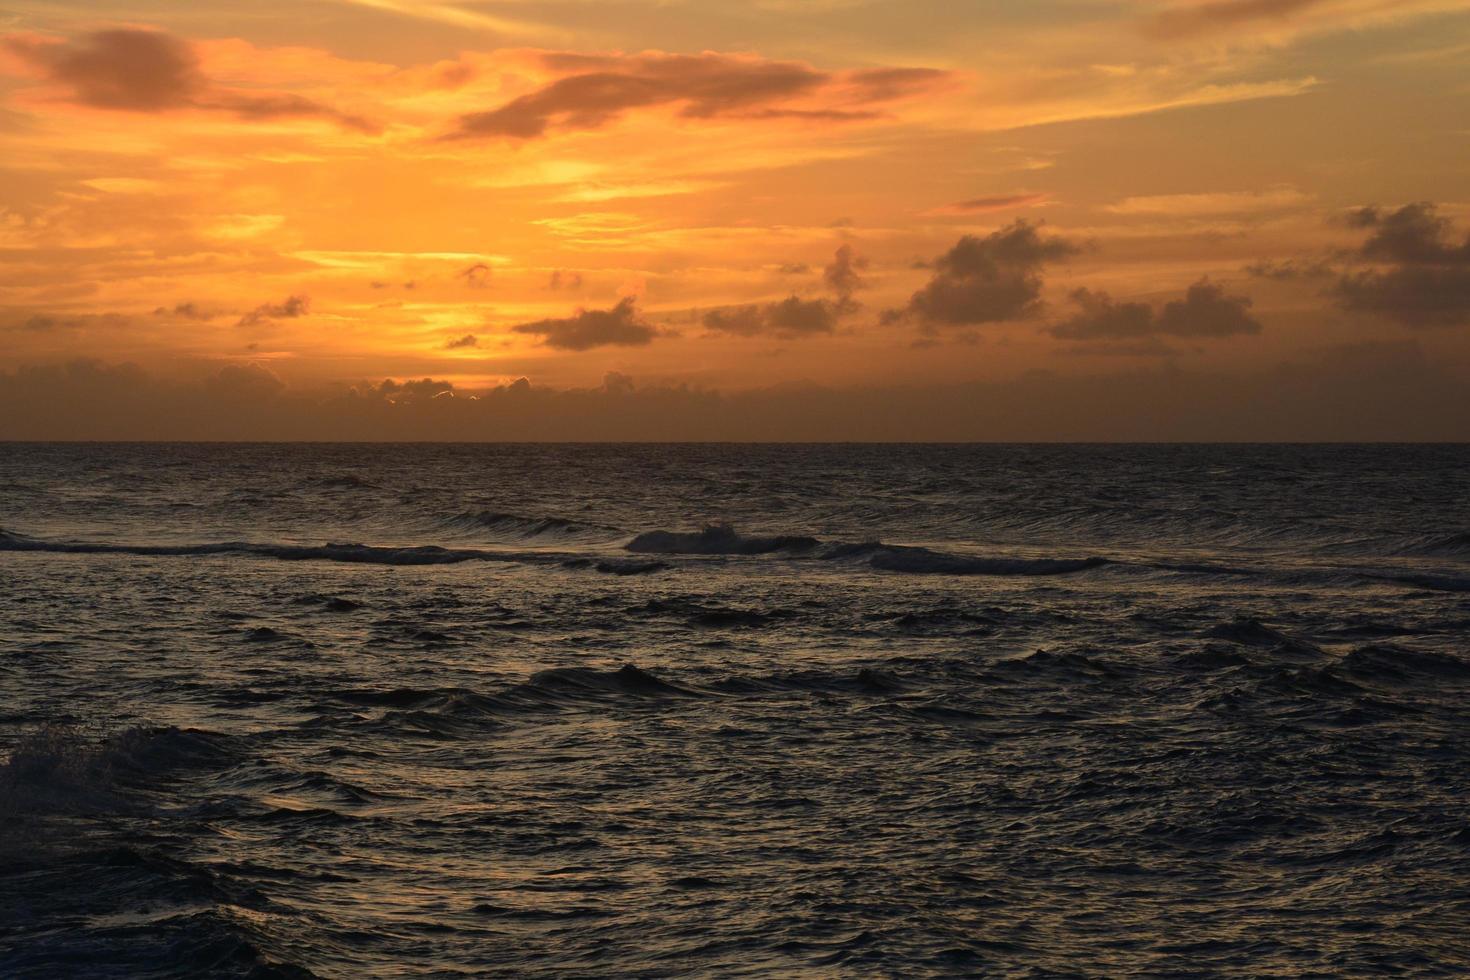 Orange sunset over the ocean photo